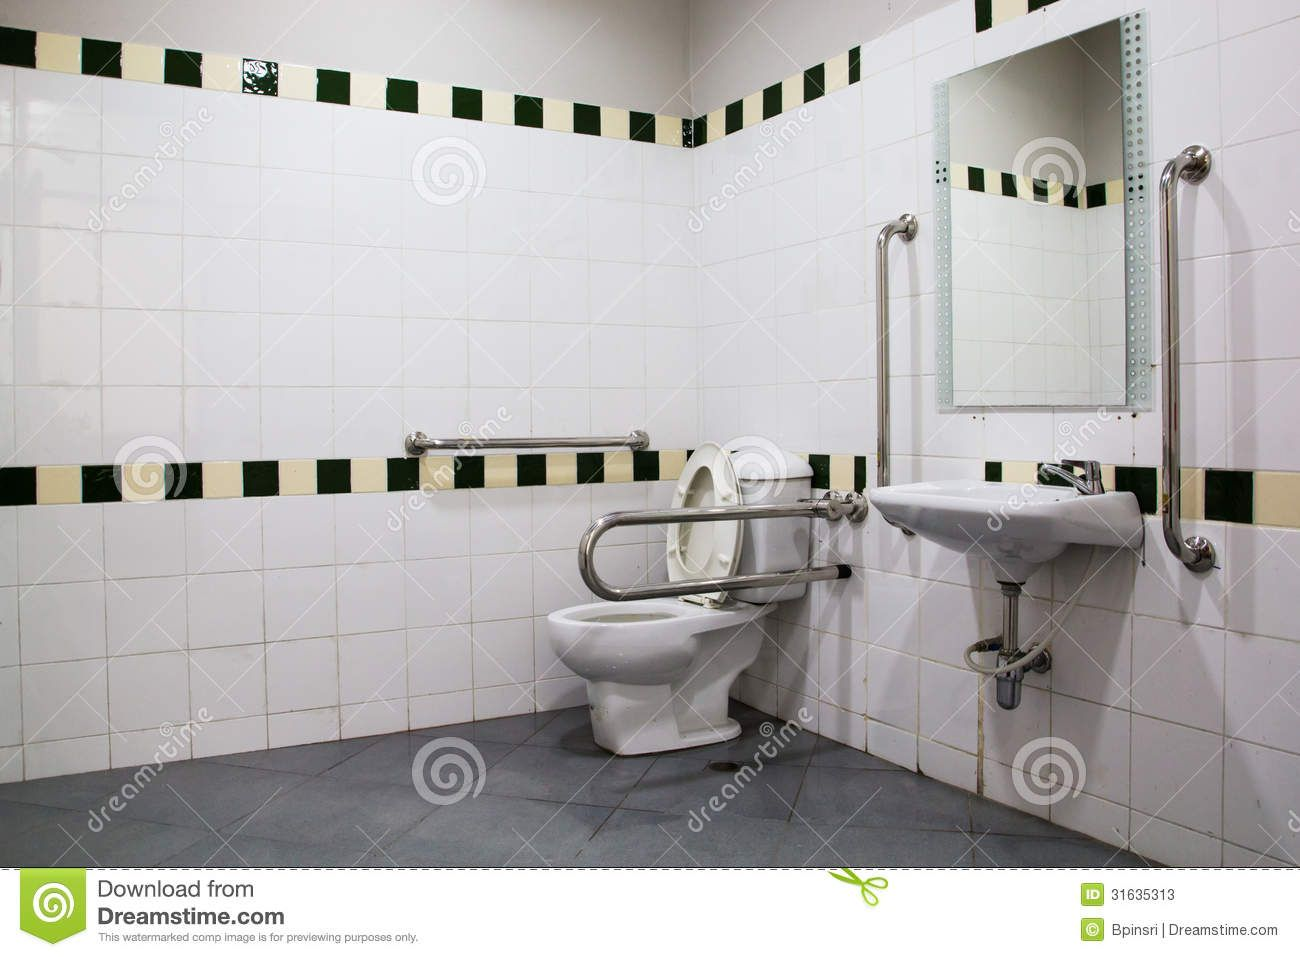 Handicap Grab Bar Placement In Bathrooms | Stock Photos: Handicap Bathroom  With Grab Bars And